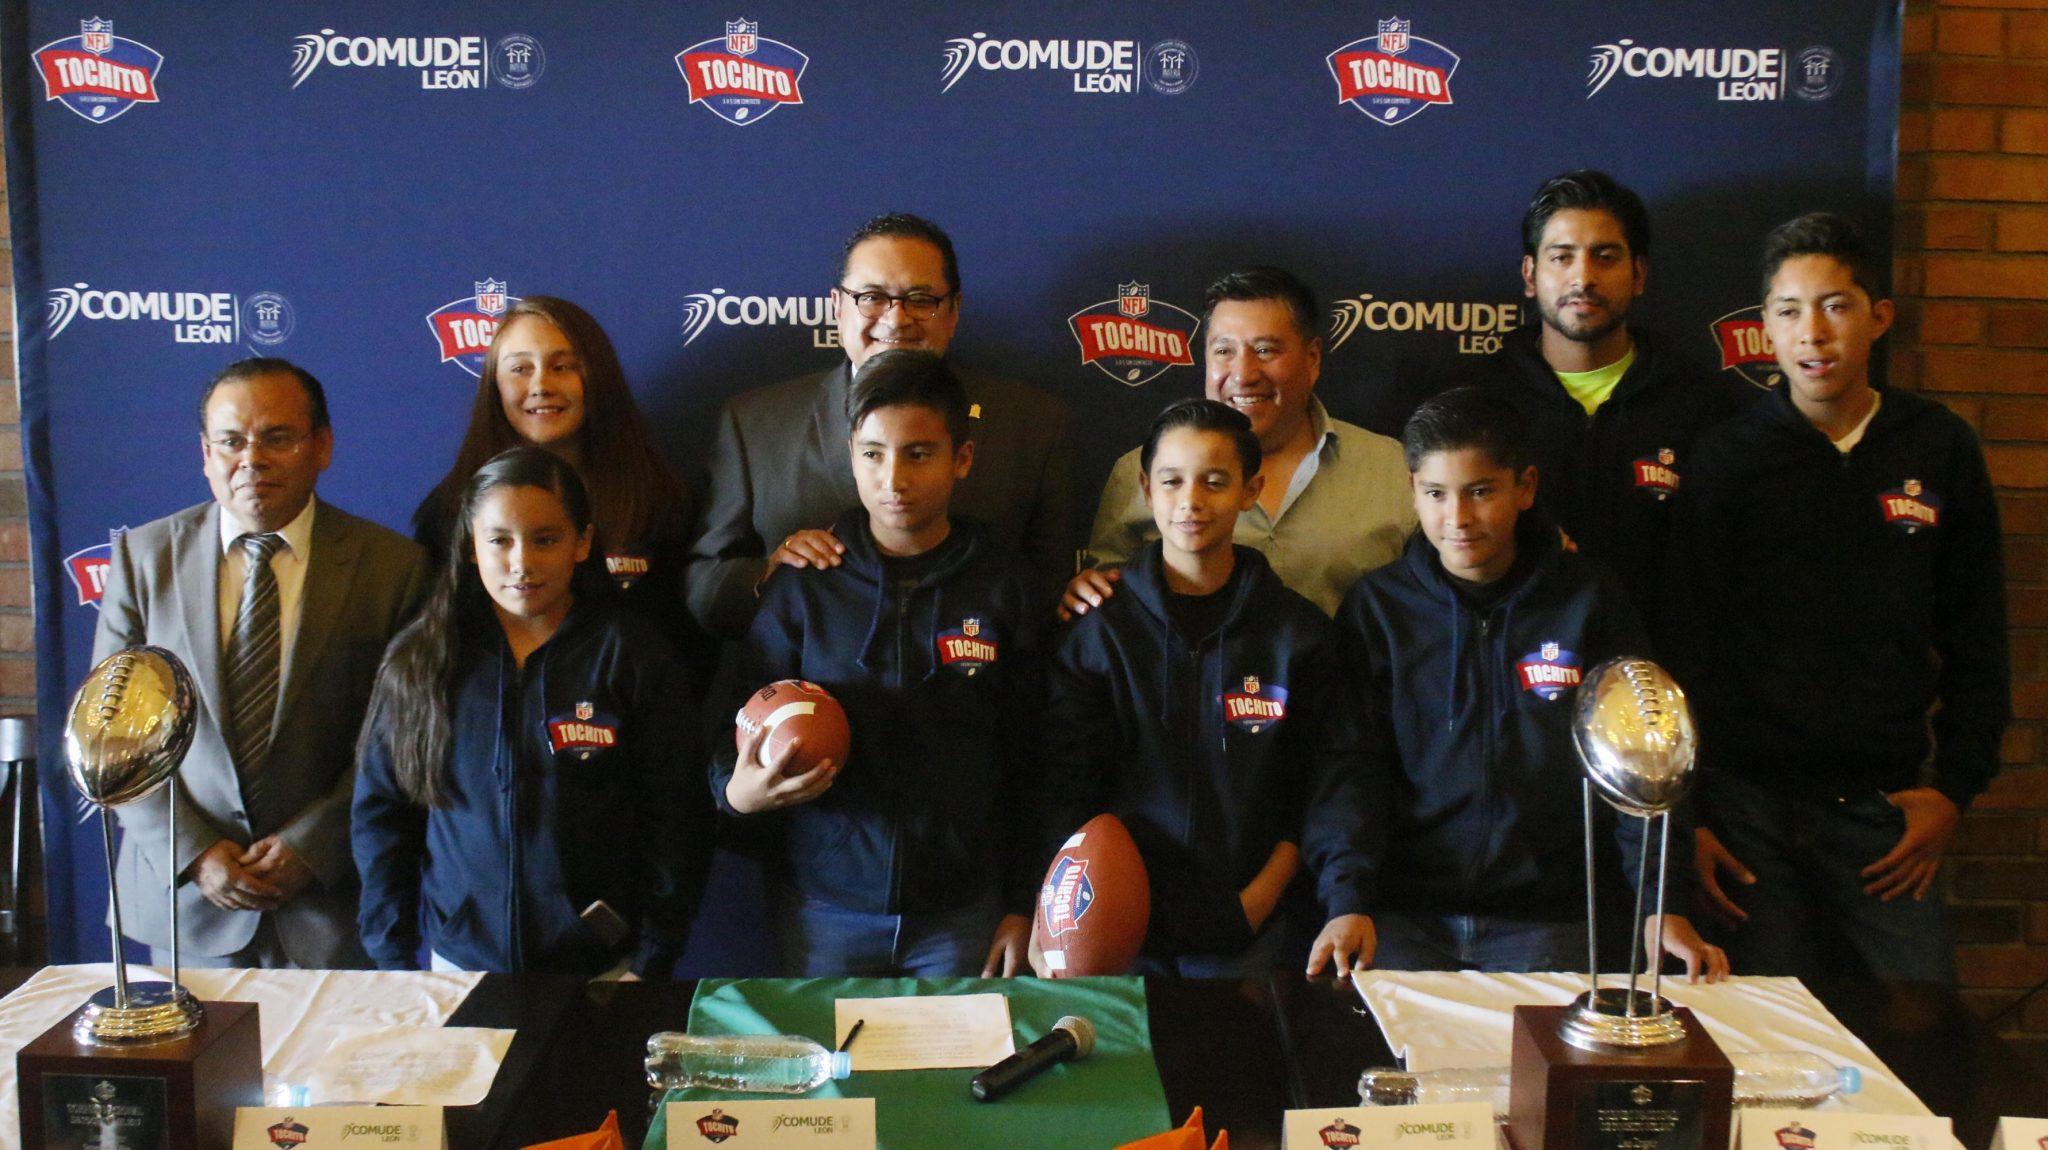 Anuncian Torneo Nacional de Tochito NFL 2017 en León.